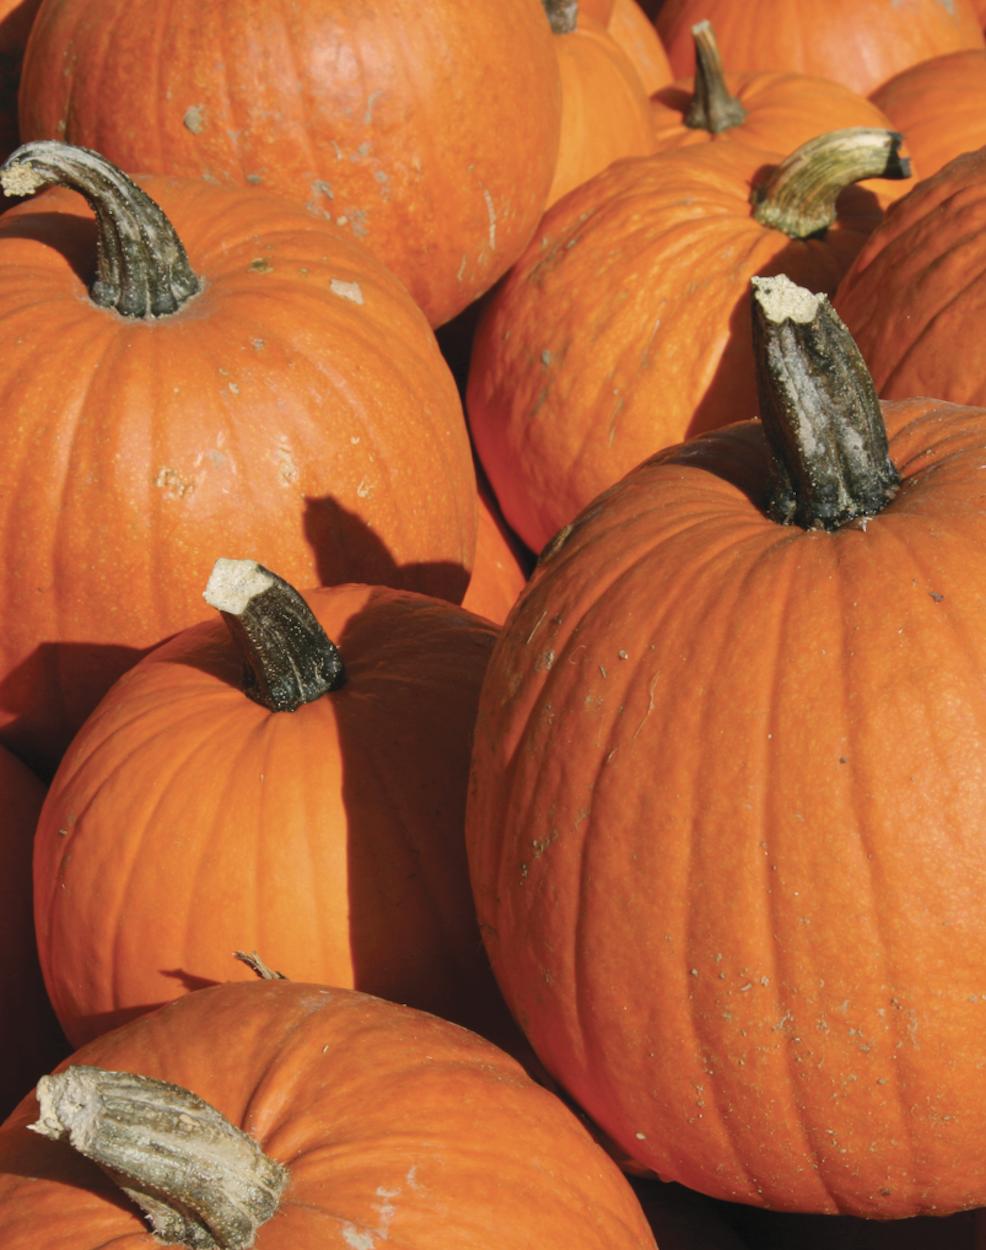 Multi-Purpose Pumpkins